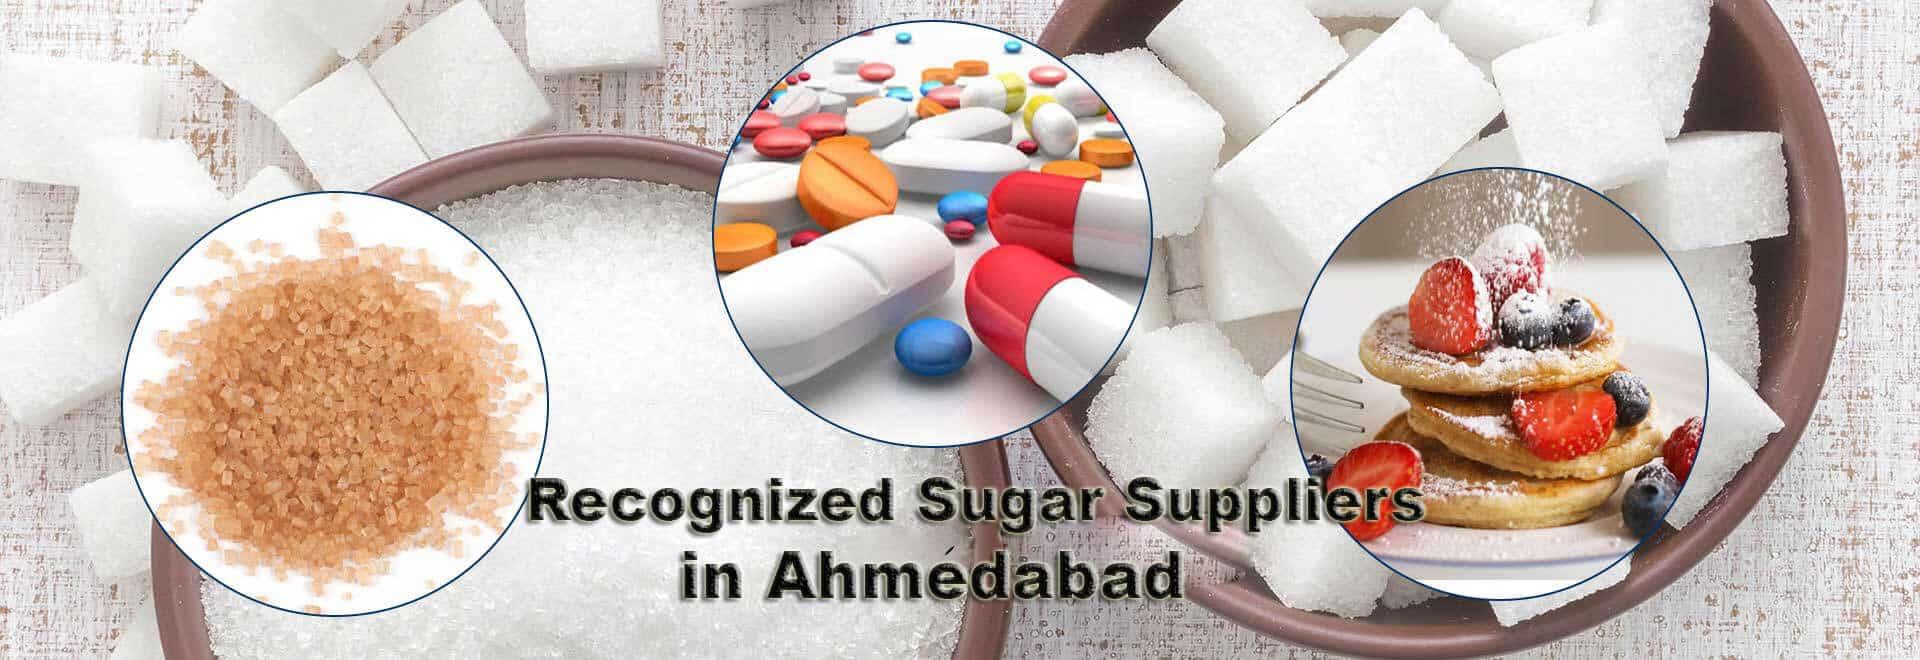 Sugar Supplier in Ahmedabad, Gujarat, India